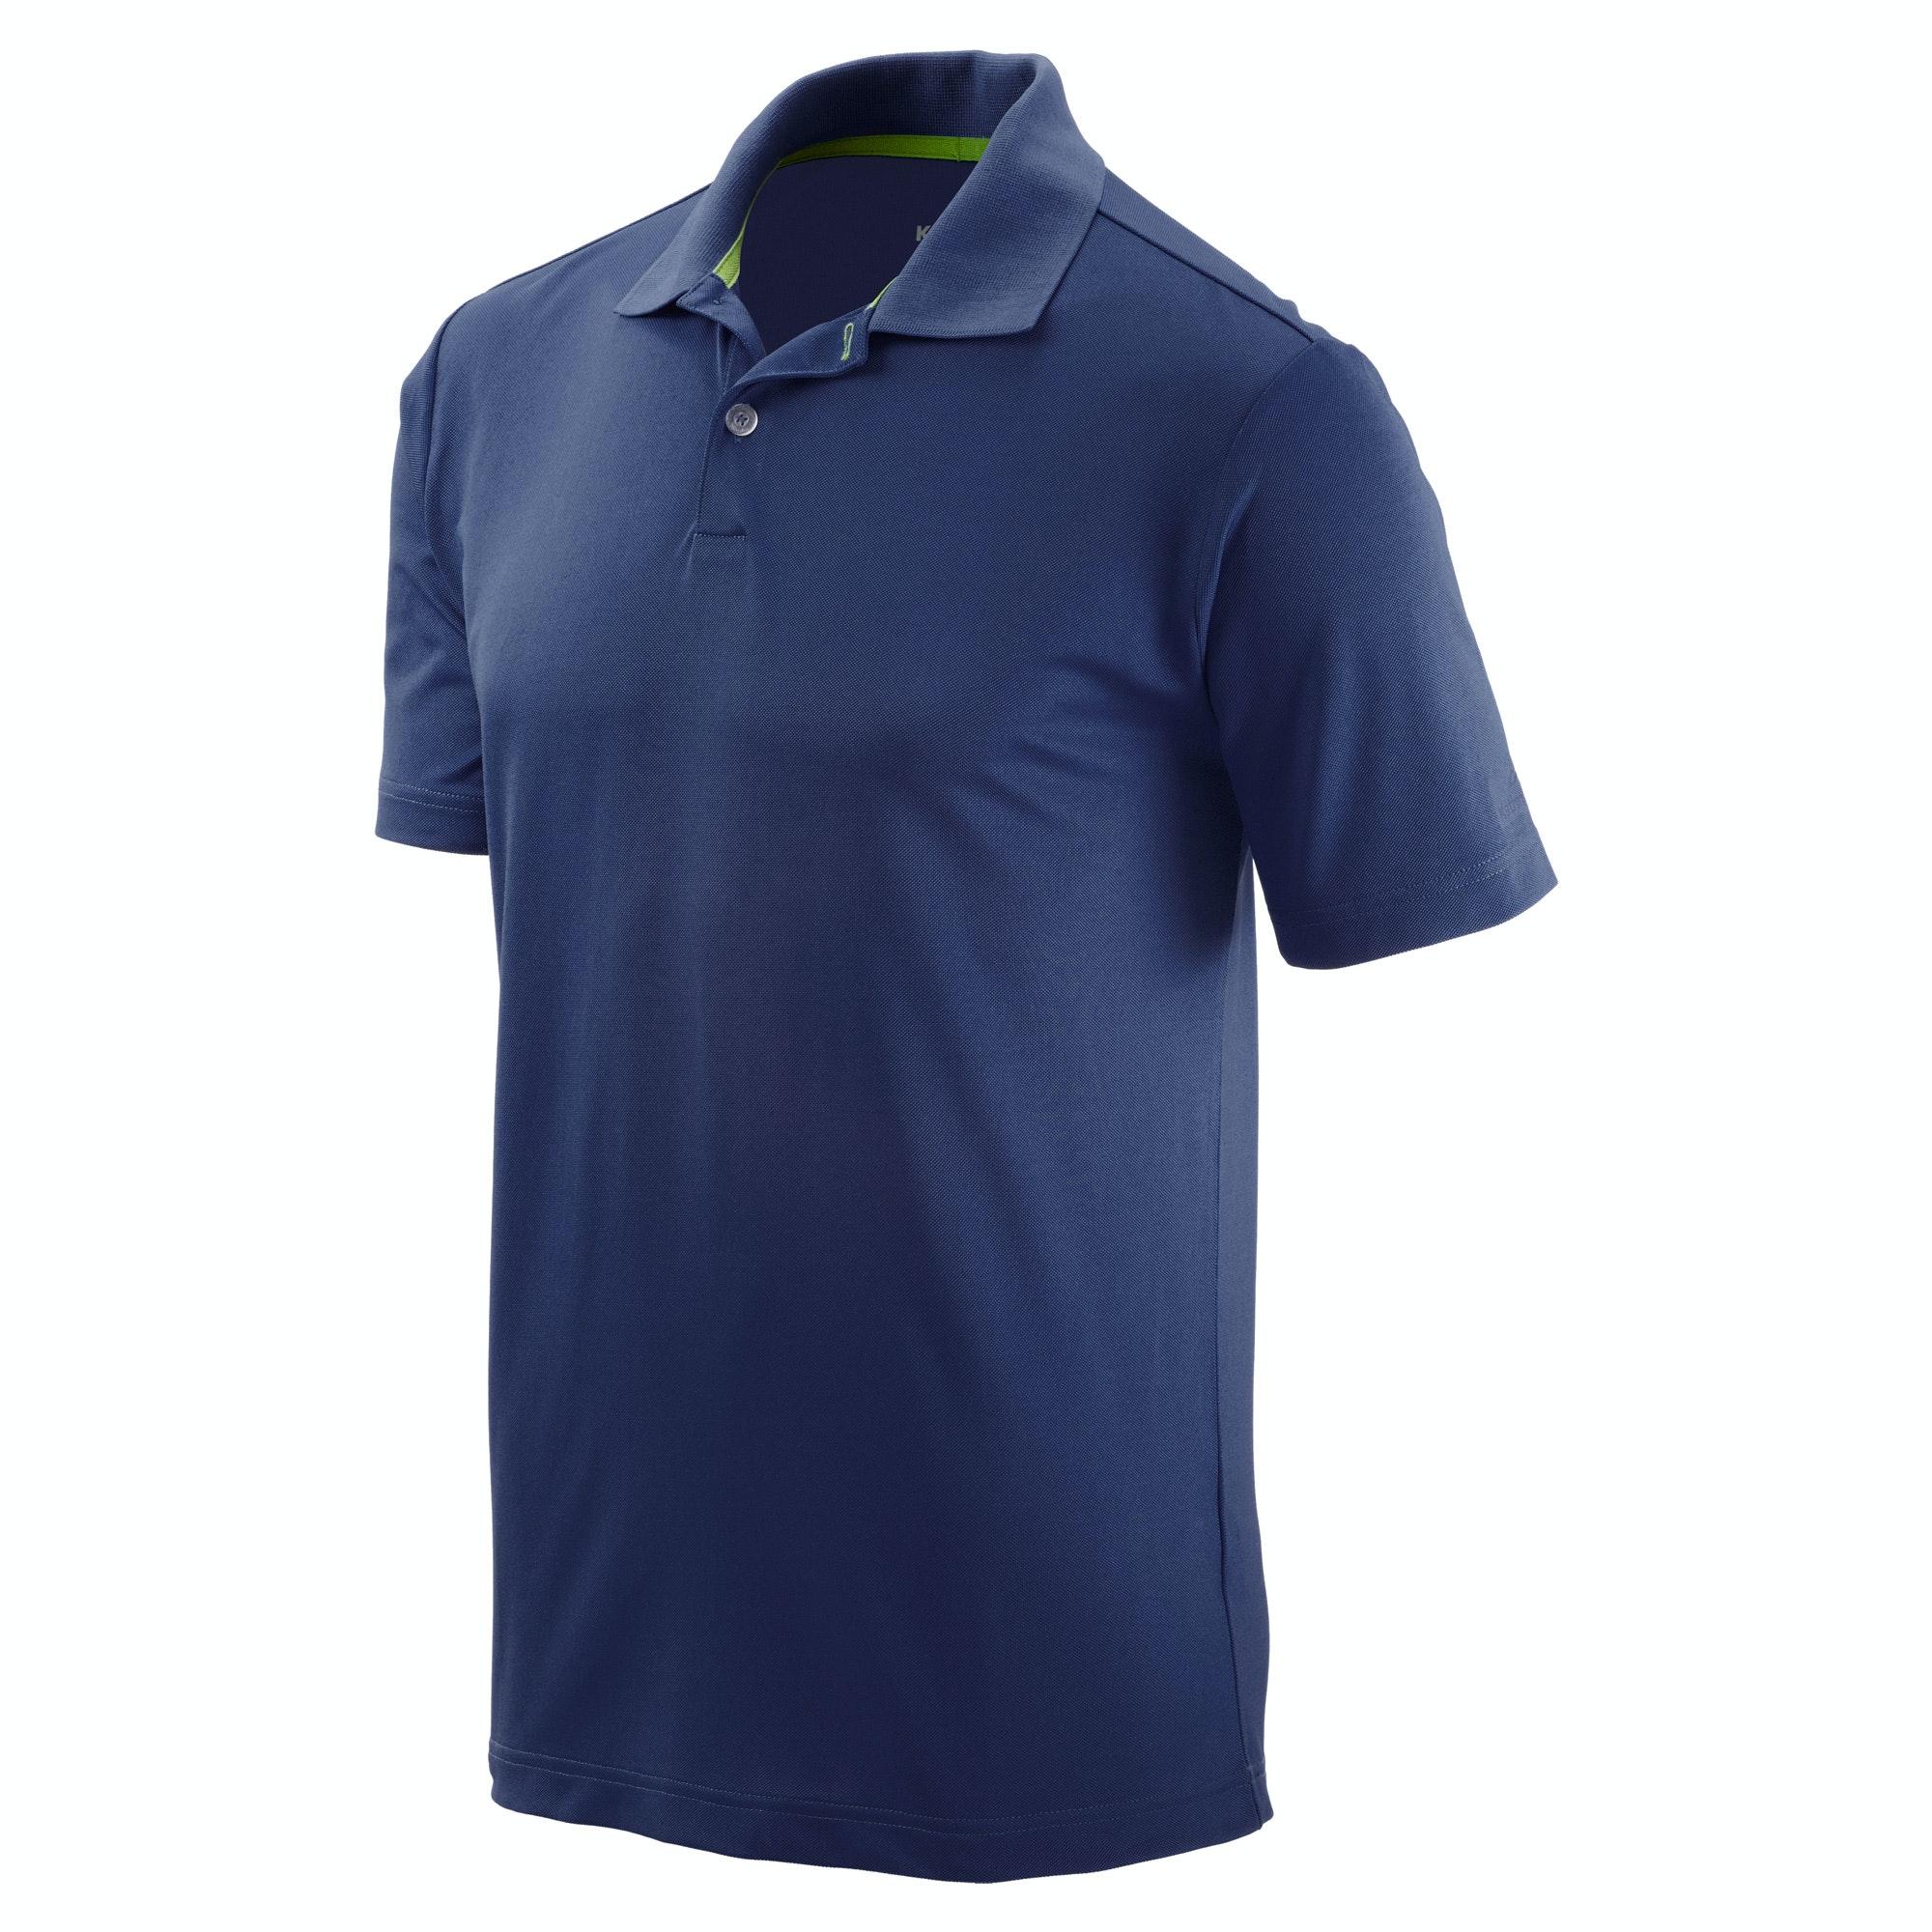 681df01e223d inexpensive us polo light blue full sleeve t shirts 93d40 ea523  hot vanua  mens short sleeve polo shirt v2 red c0920 dcf67